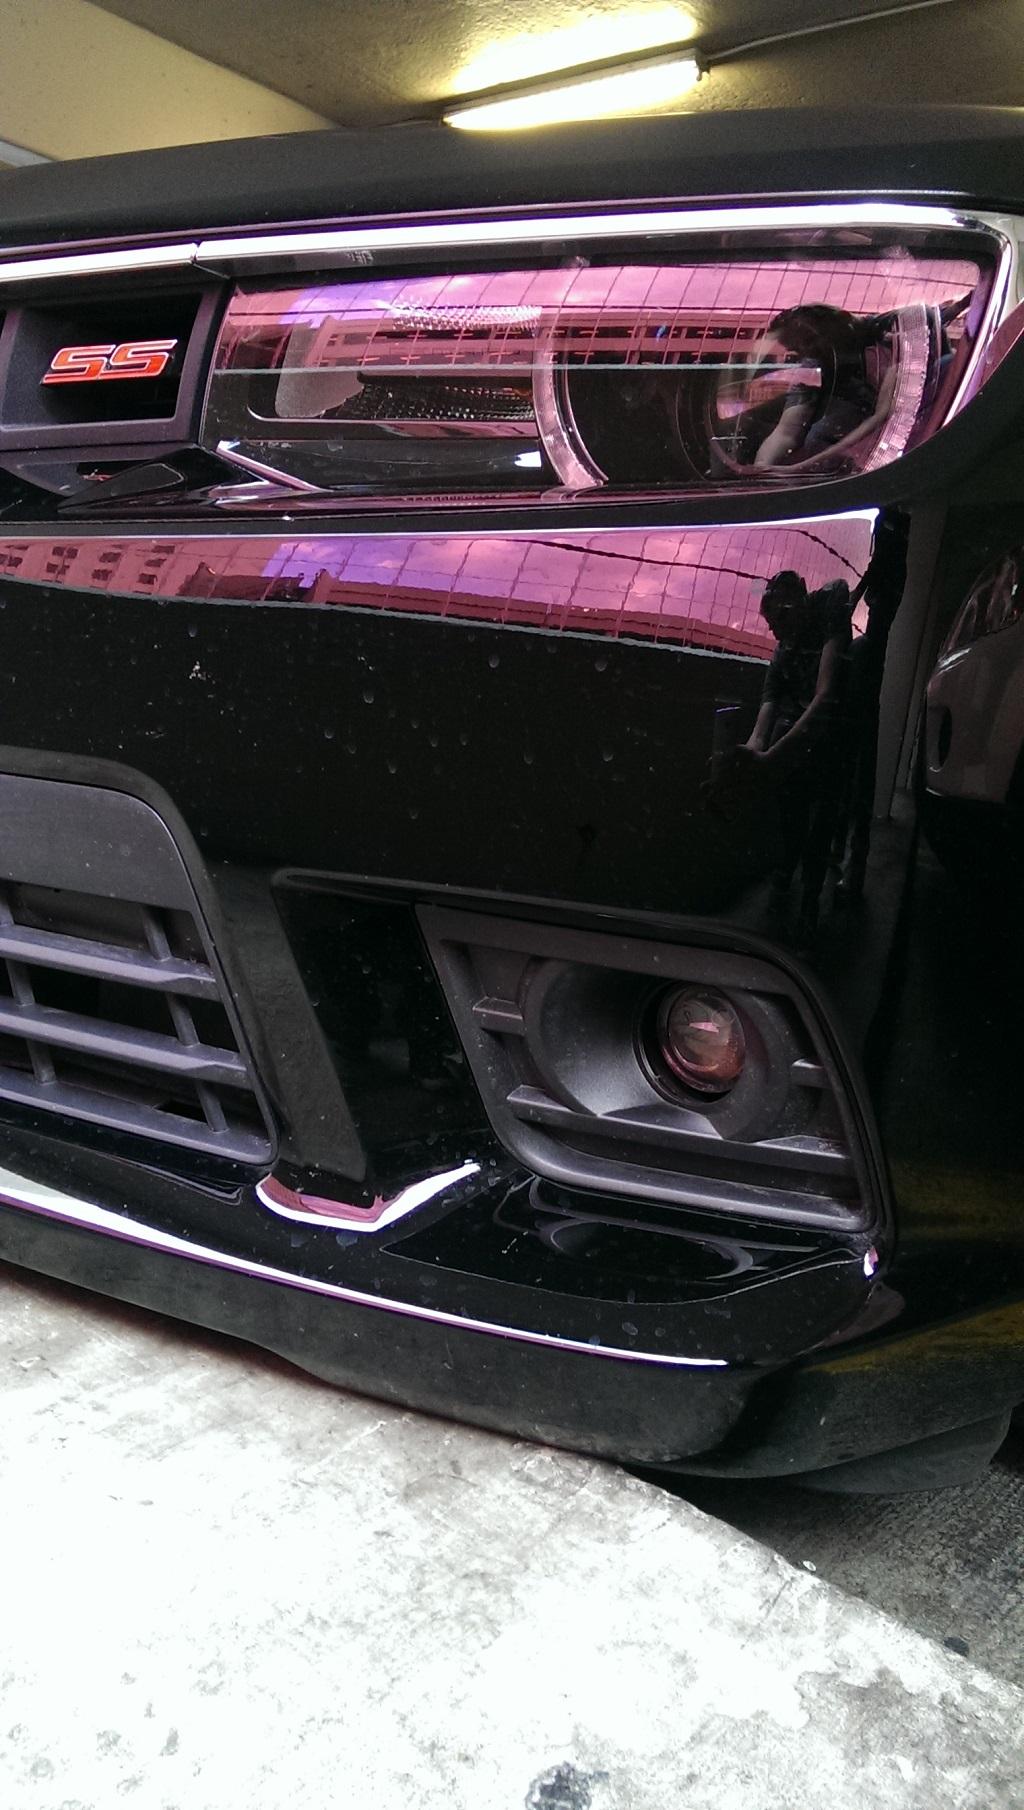 NRC 2015 - 2015 Chevy Camaro SS - 400 HP